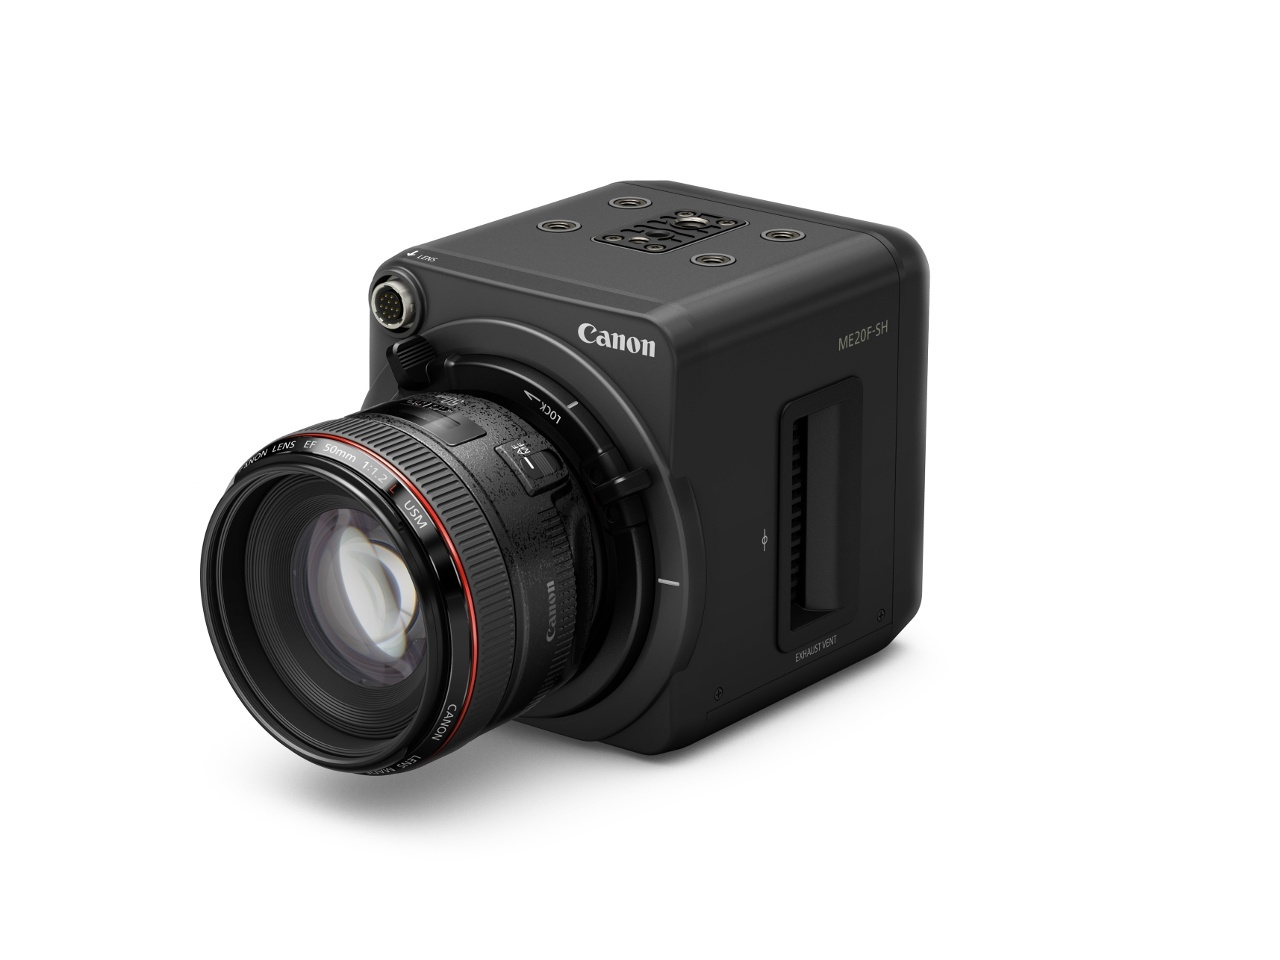 canon-me-20f-sh-020815-5